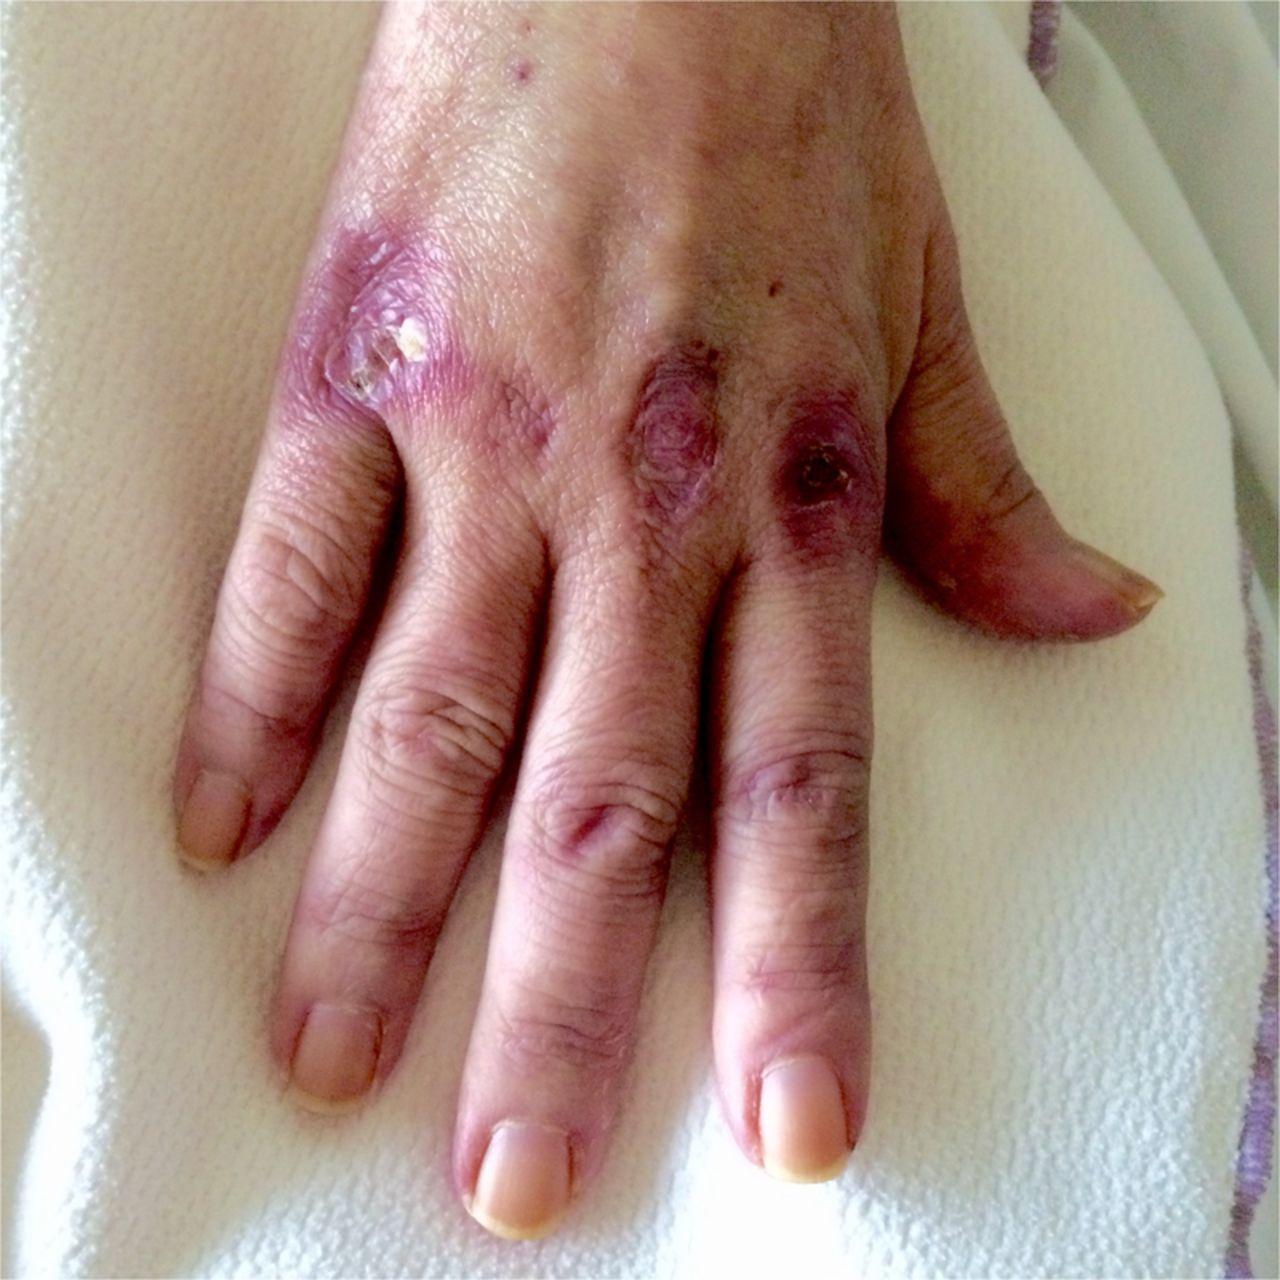 Cardiac Tamponade As A Manifestation Of Severe